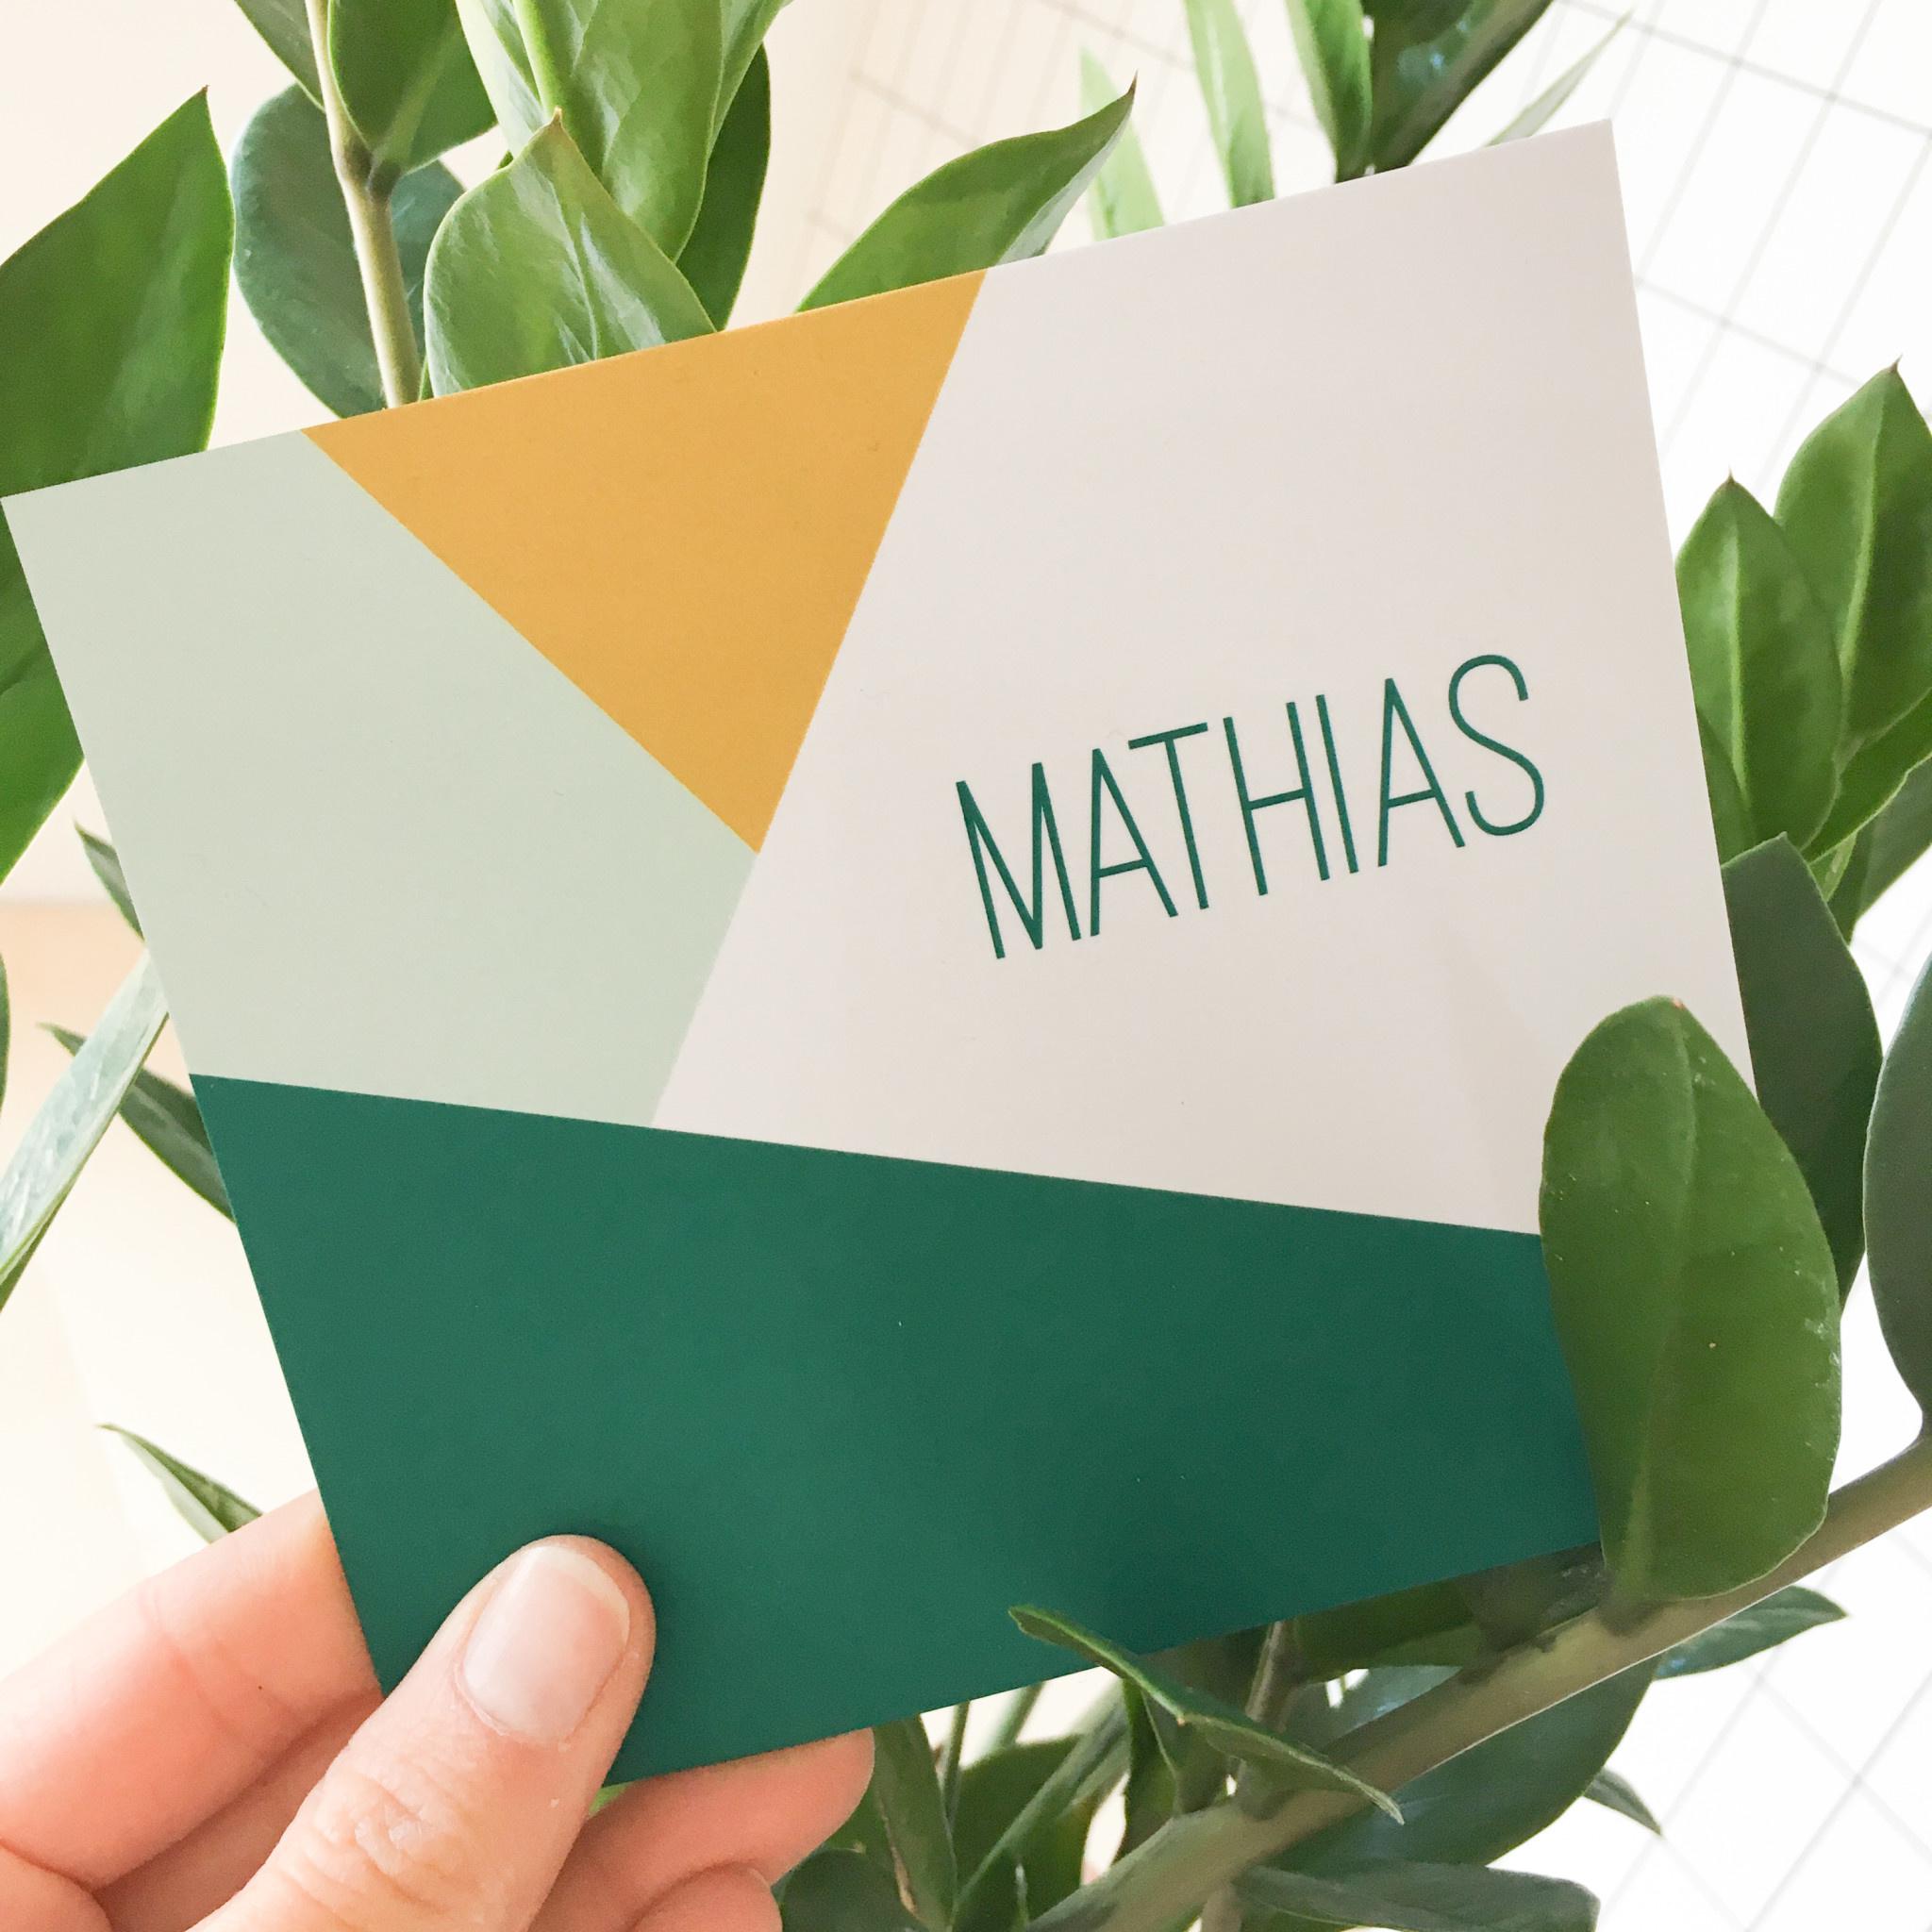 geboren_10-01 Matthias